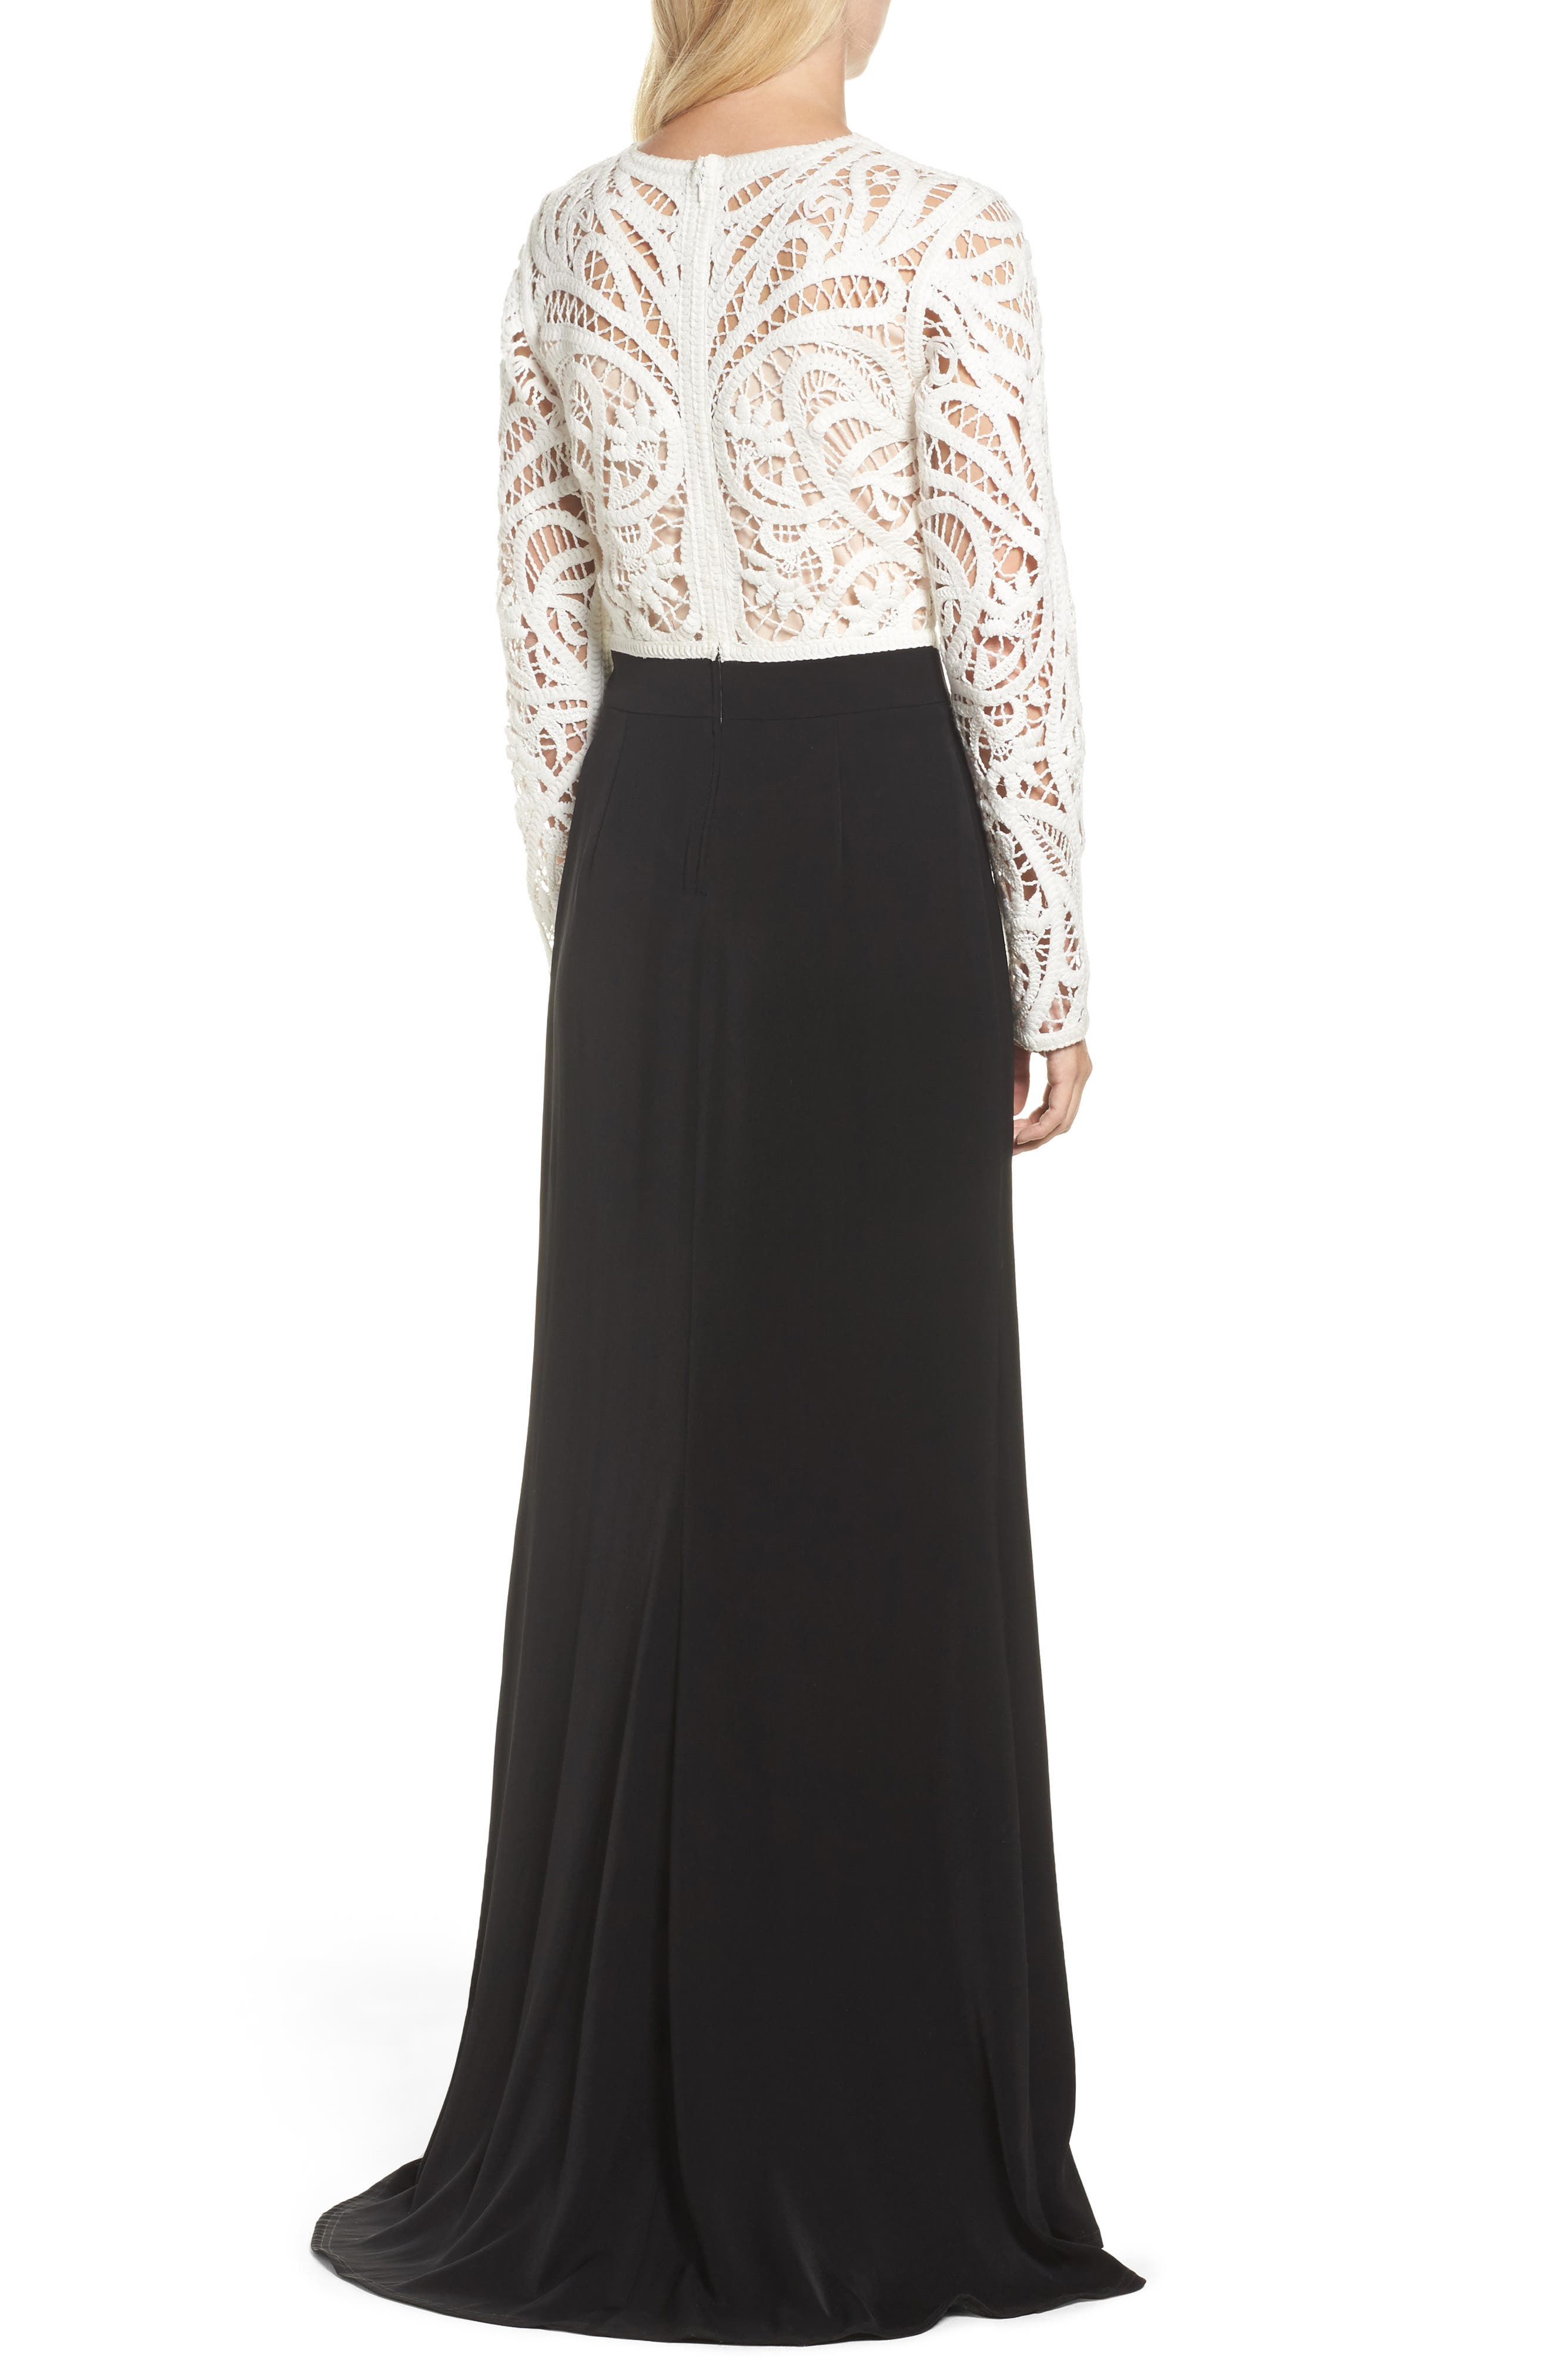 Crochet Lace & Crepe Gown,                             Alternate thumbnail 2, color,                             Ivory/ Black